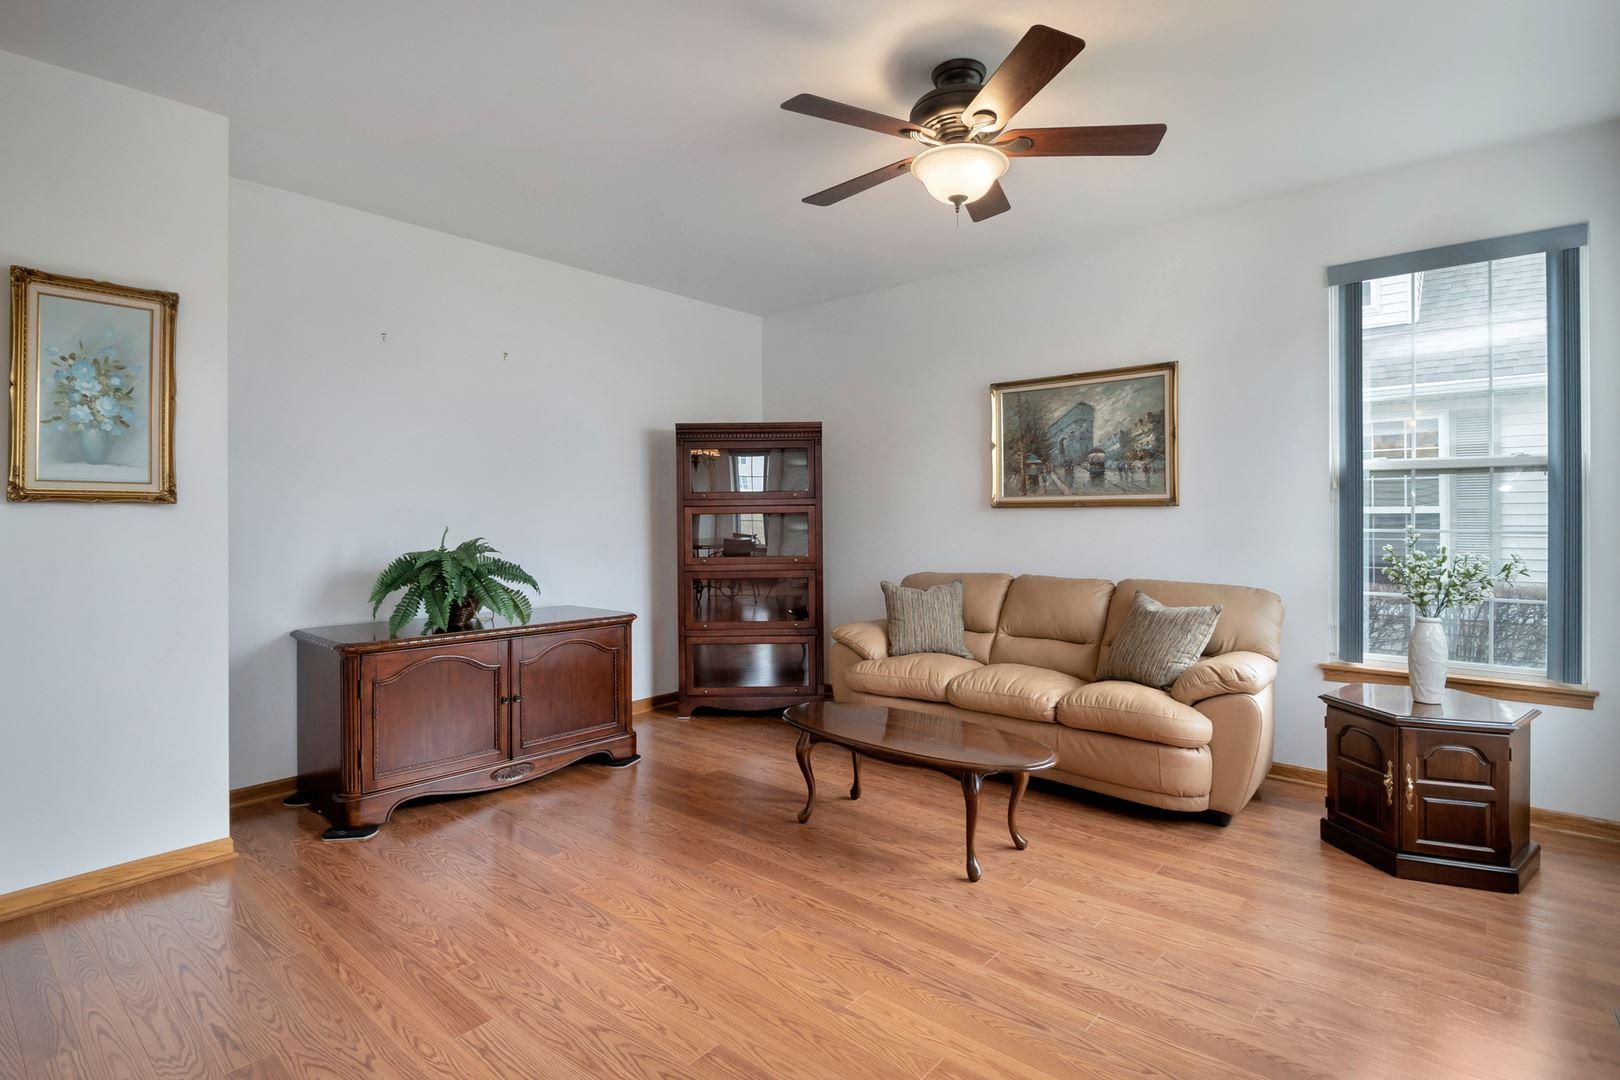 Photo of 1635 Augusta Lane, Shorewood, IL 60404 (MLS # 11049177)